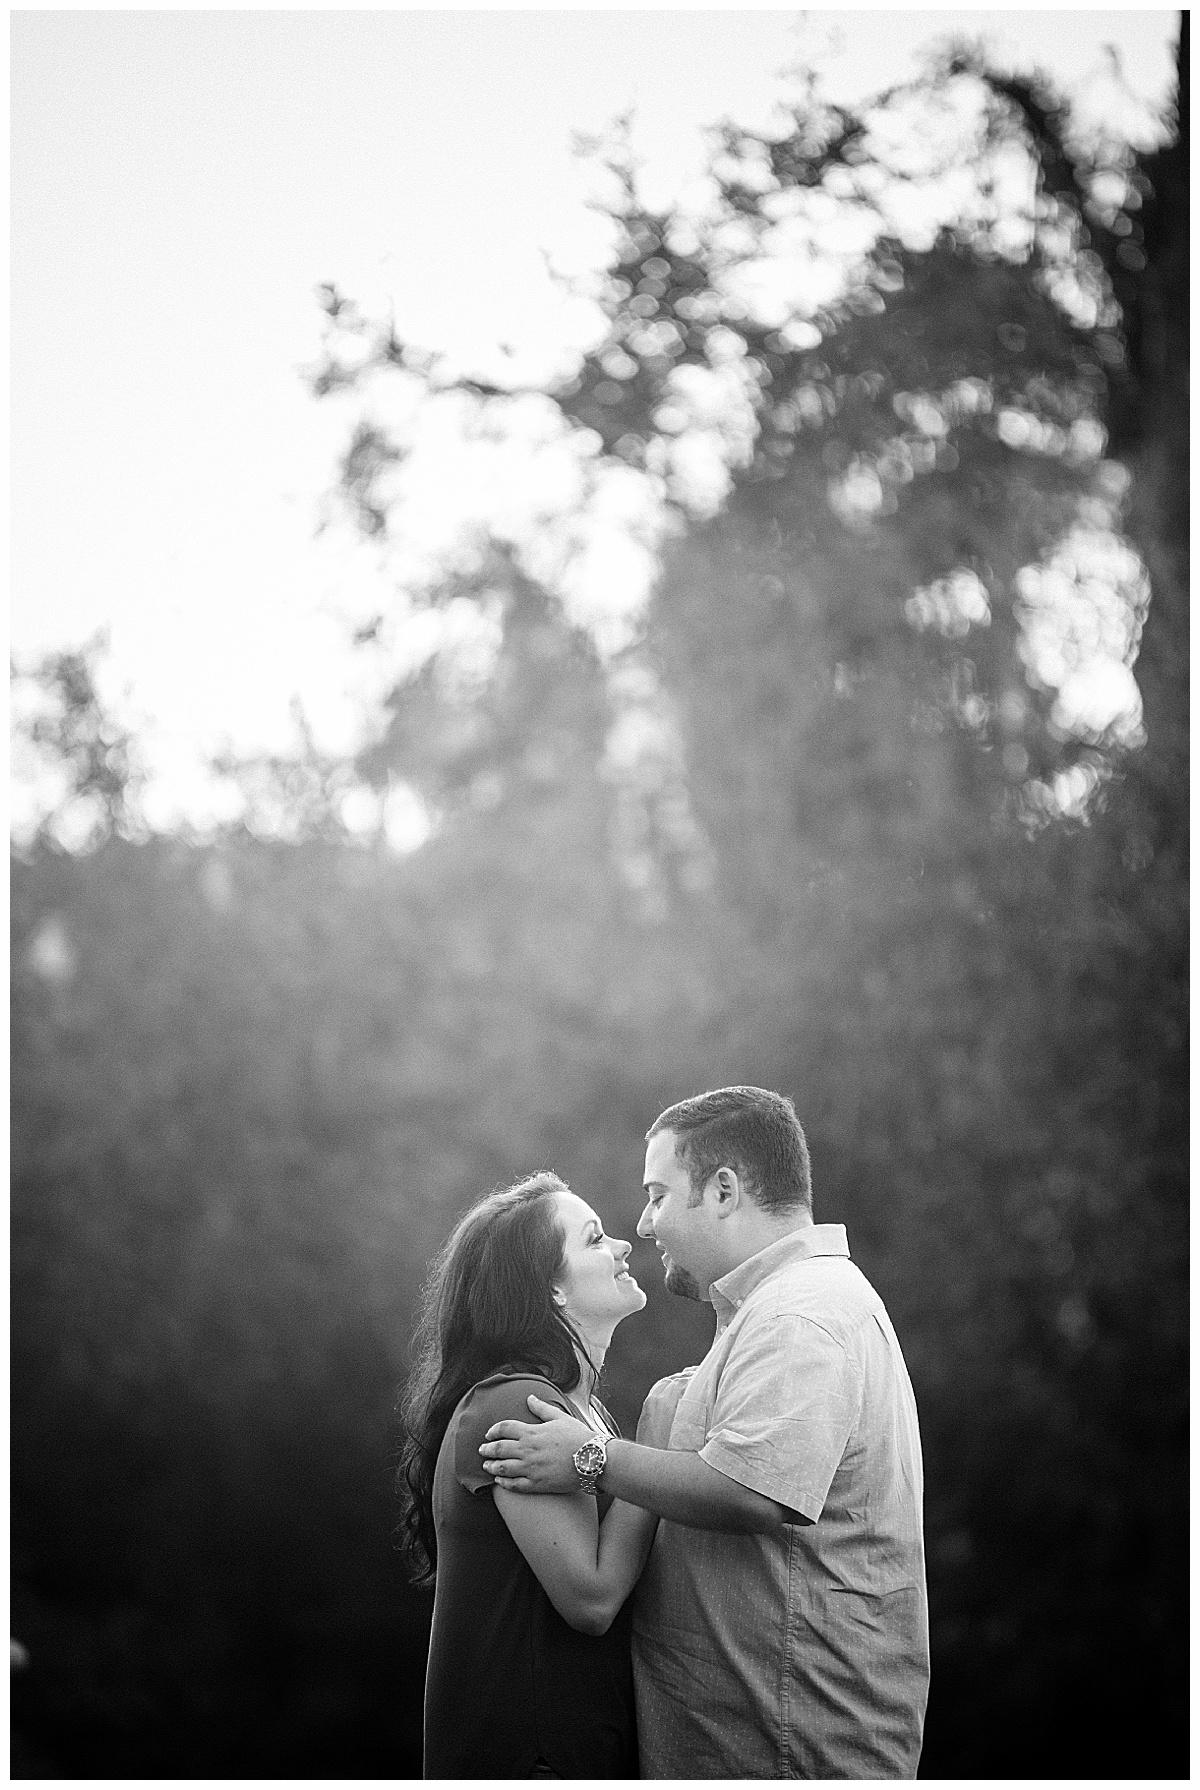 Engagement photography at Memorial Park in Stuart Fl